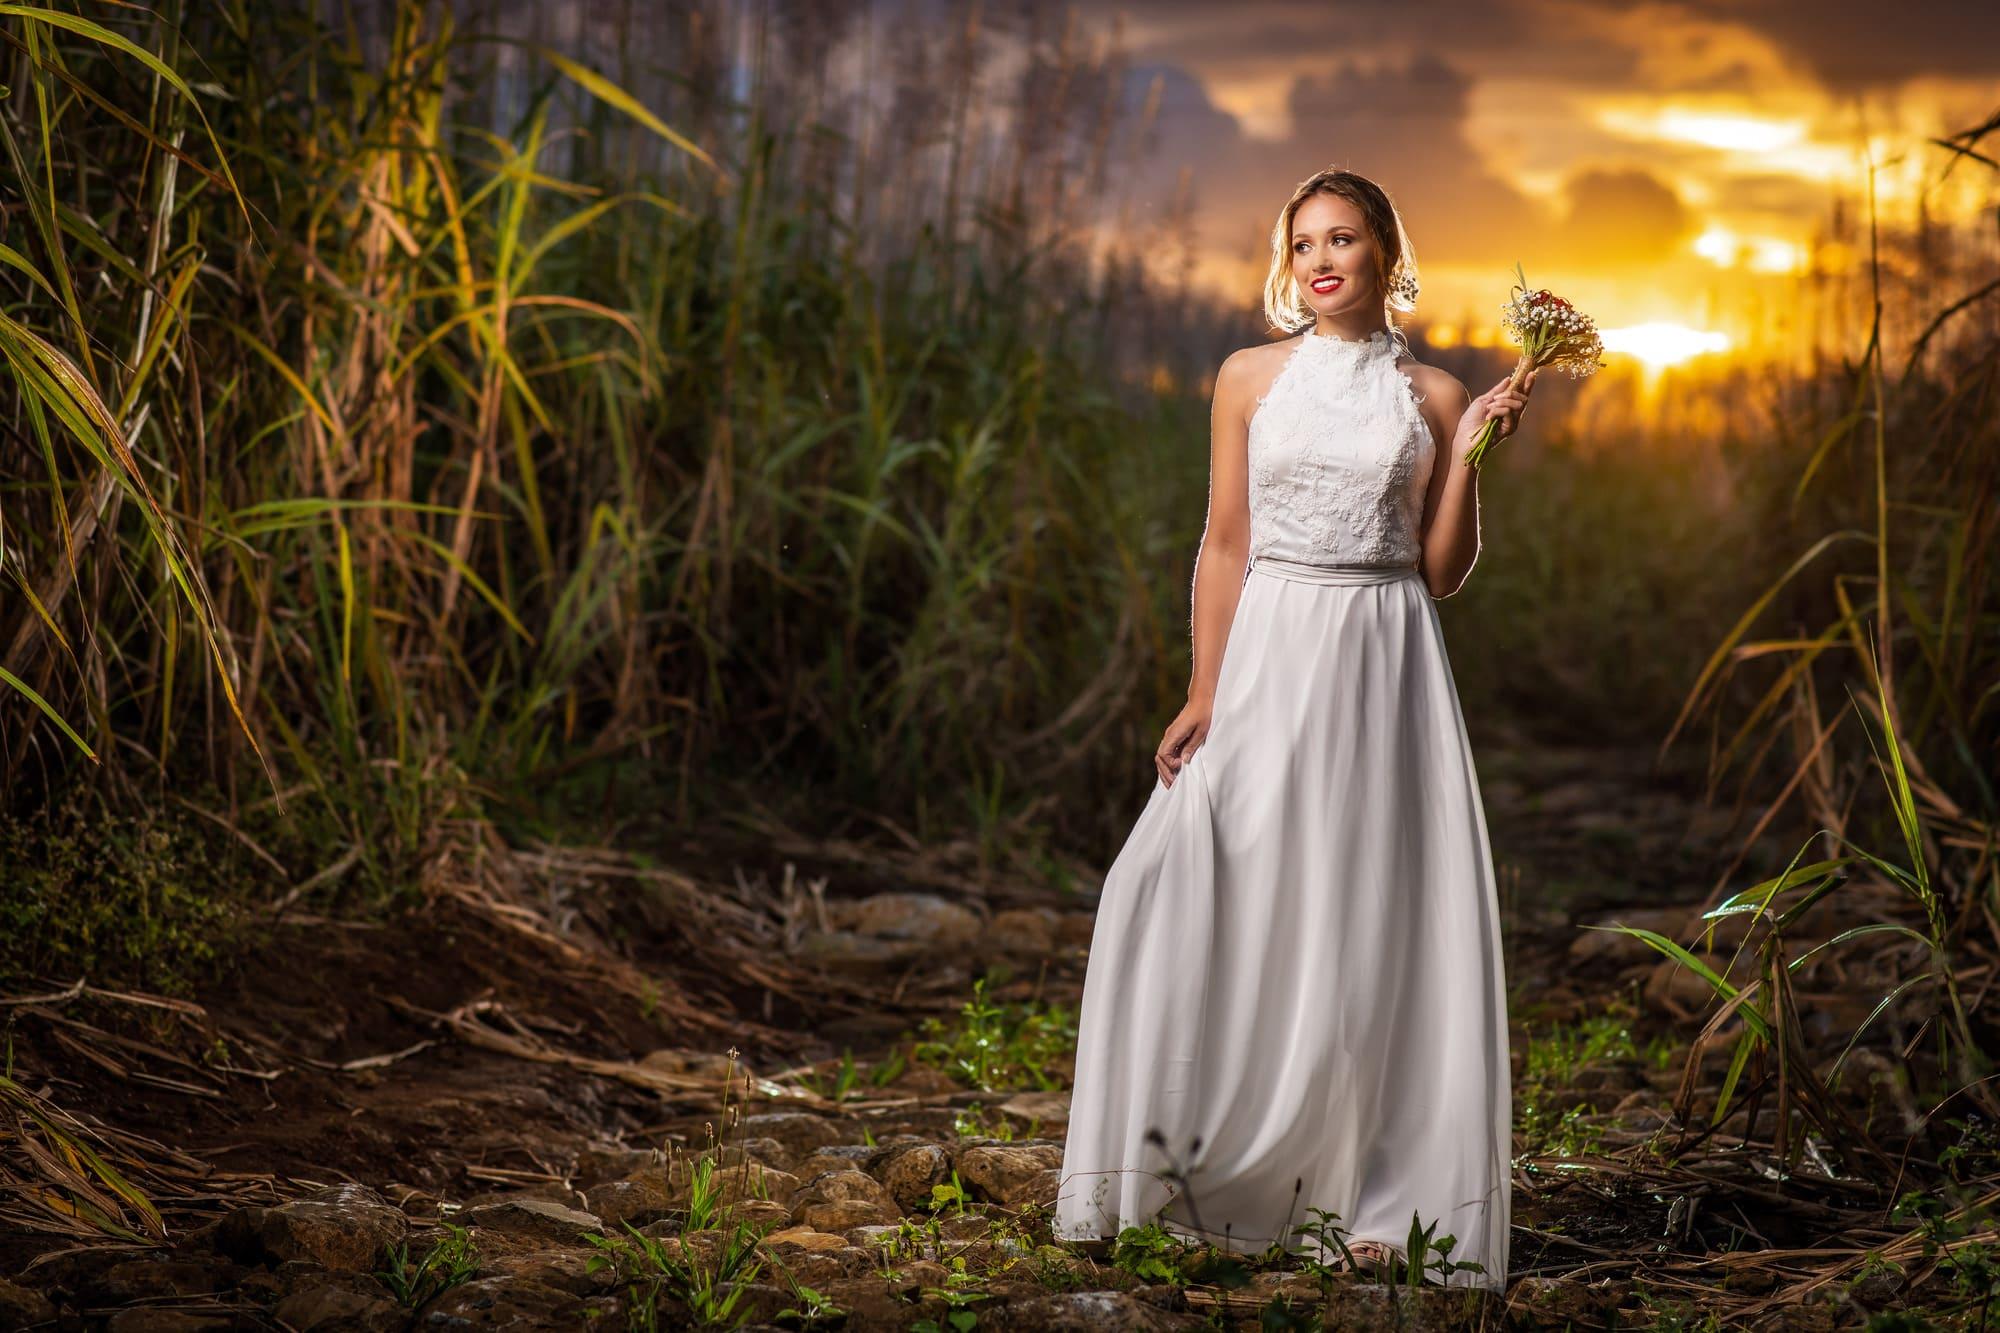 Sugar cane photoshoot Bridal session-8.jpg